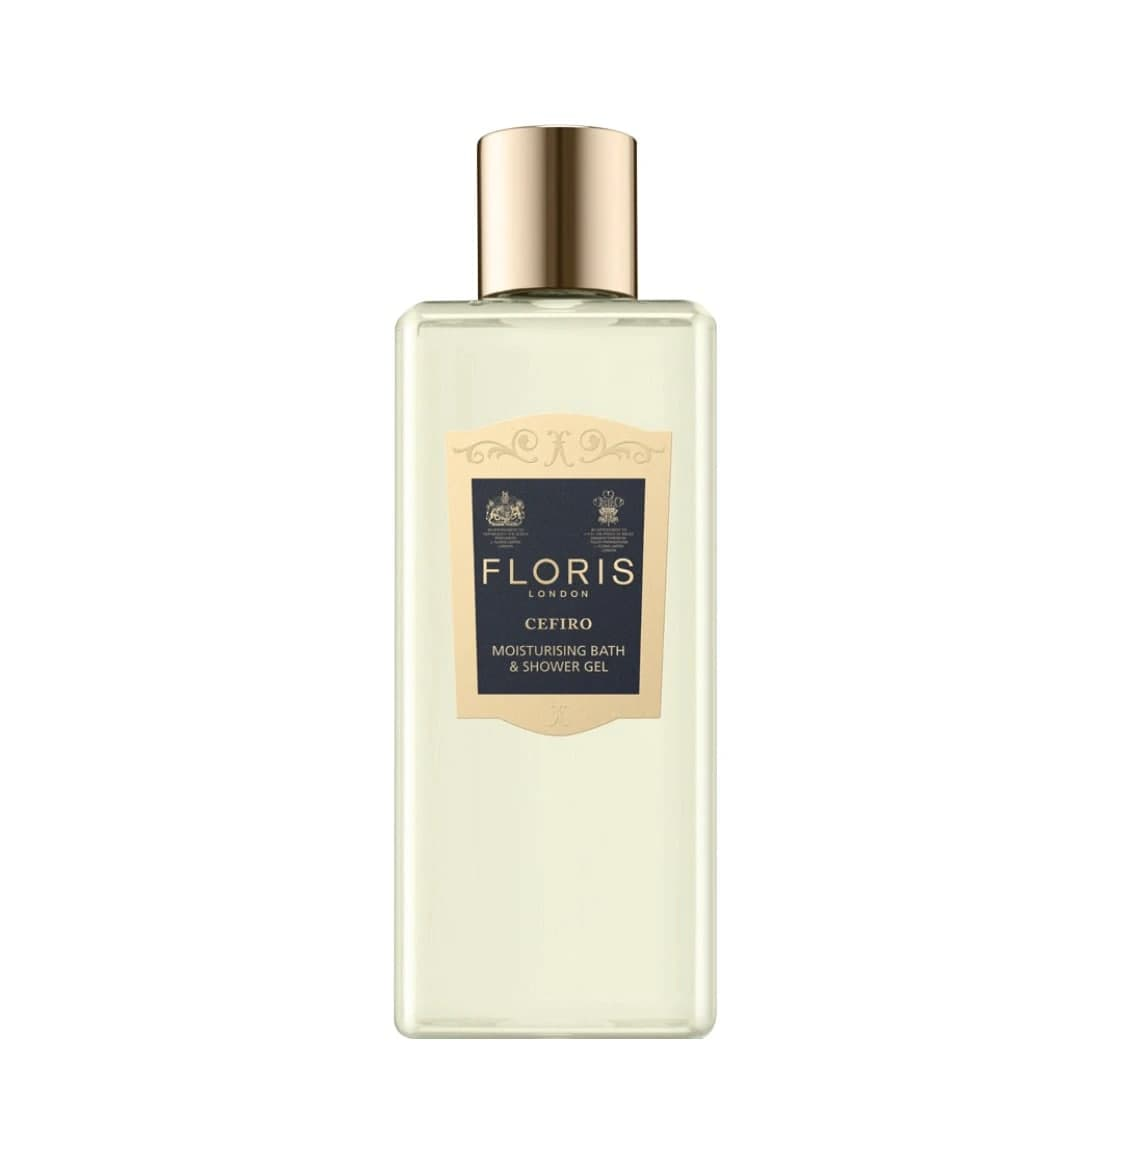 Floris London Cefiro Moisturising Bath And Shower Gel 250ml